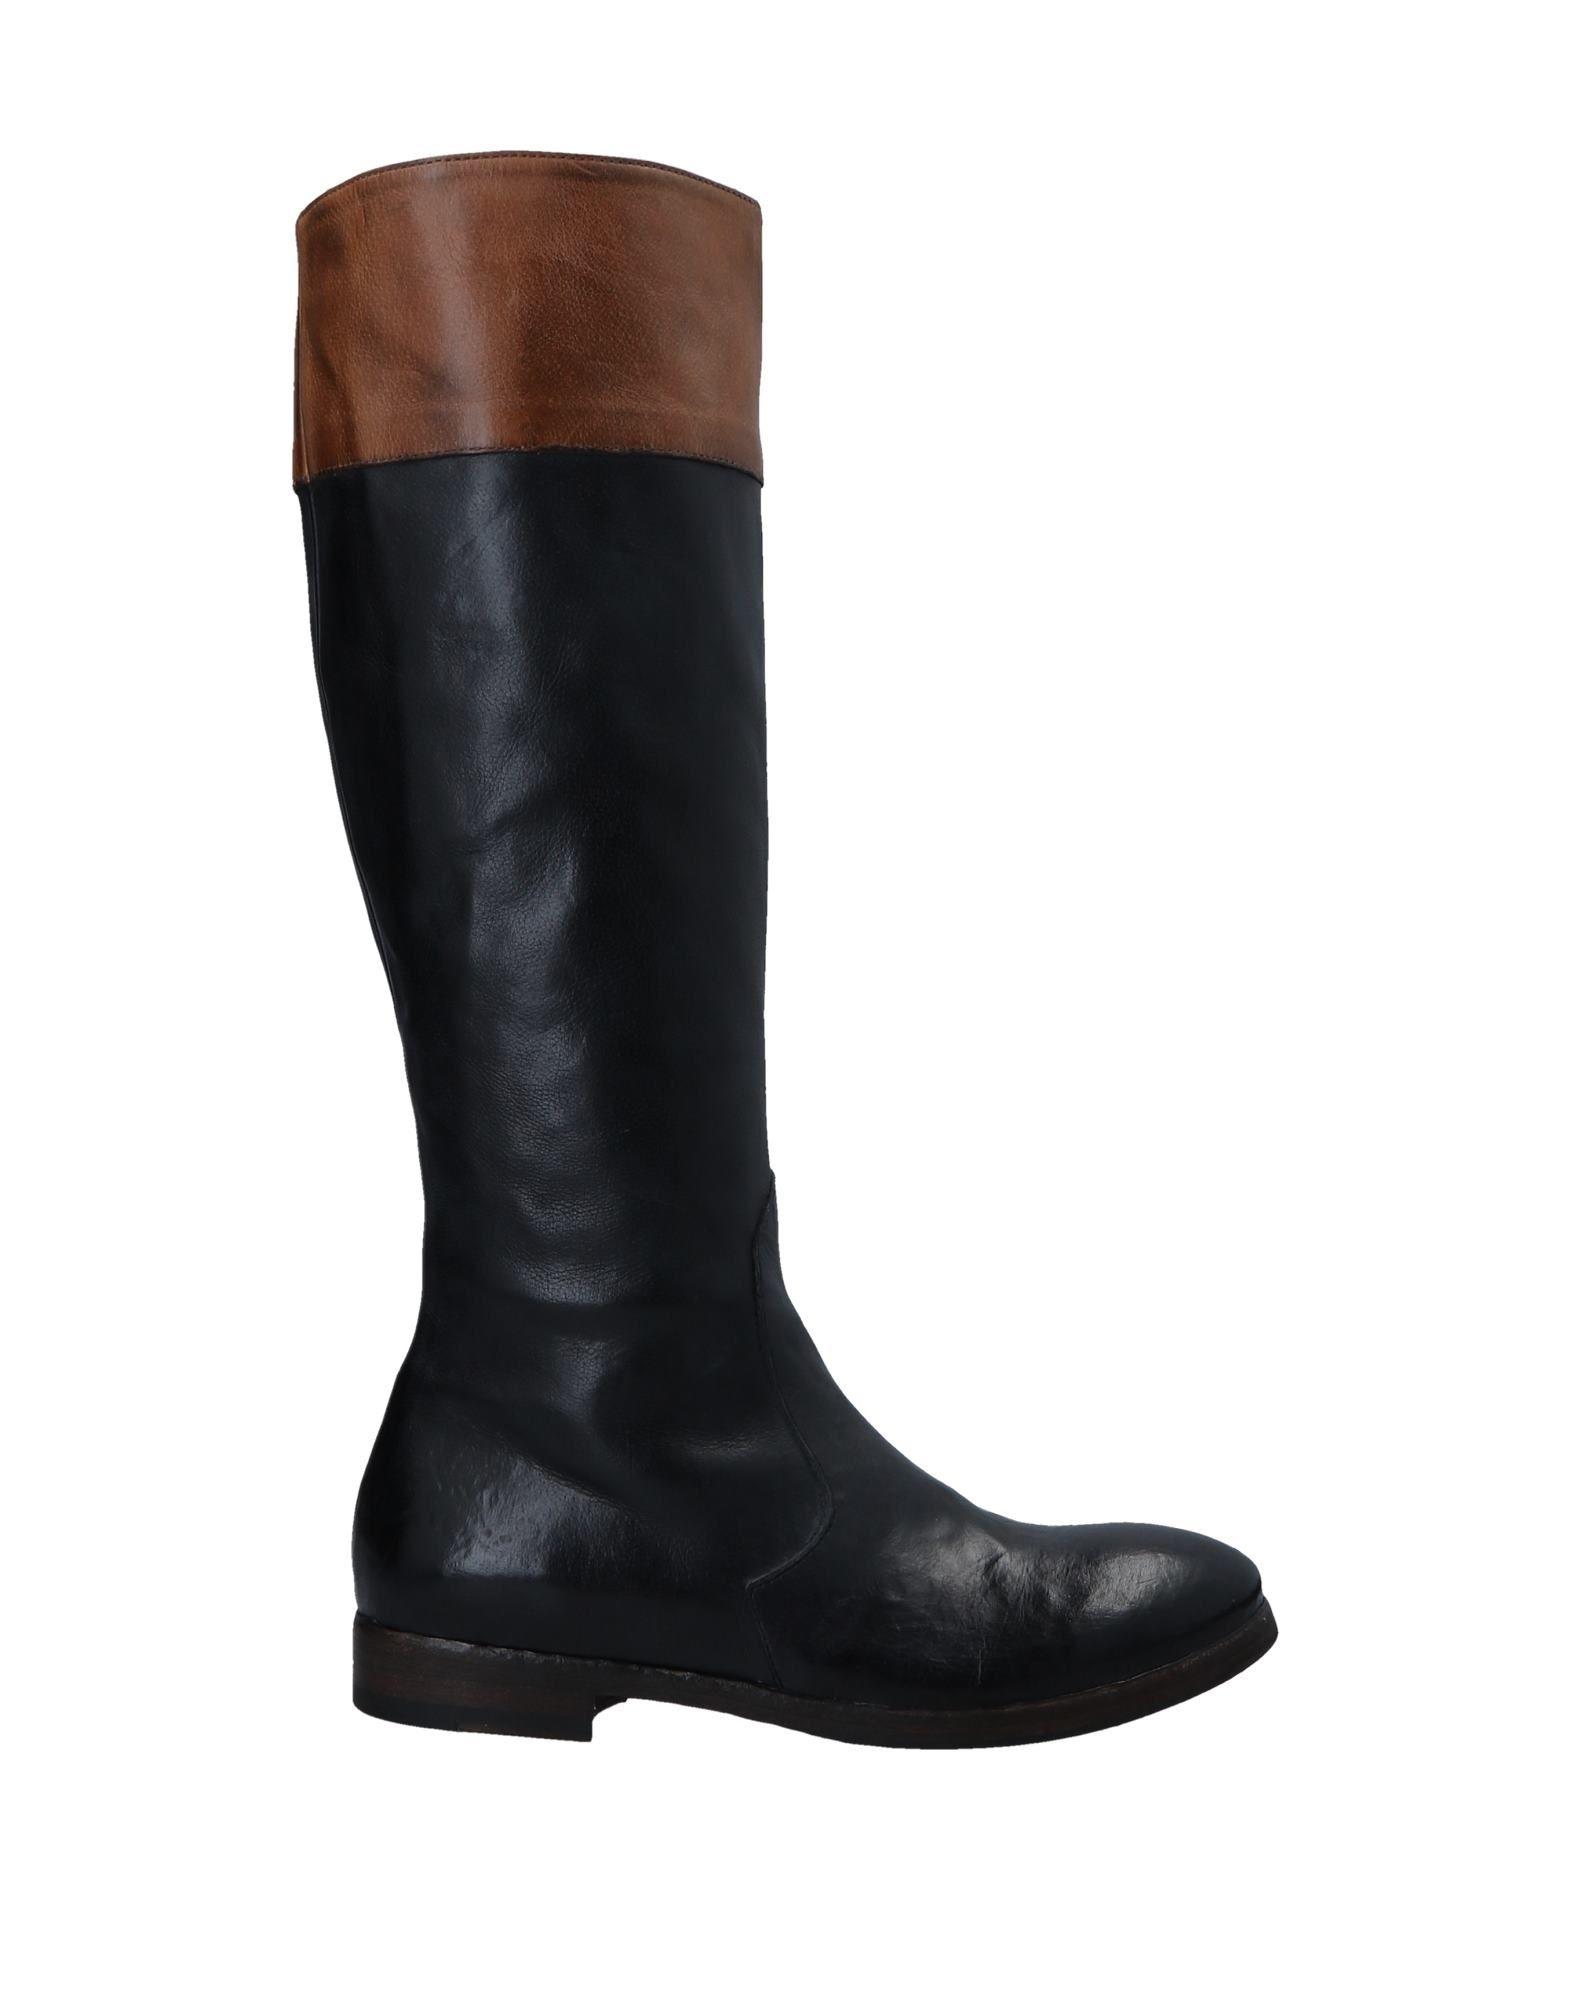 La Bottega Di La Lisa Boots - Women La Di Bottega Di Lisa Boots online on  Australia - 11552988GQ 4037b9